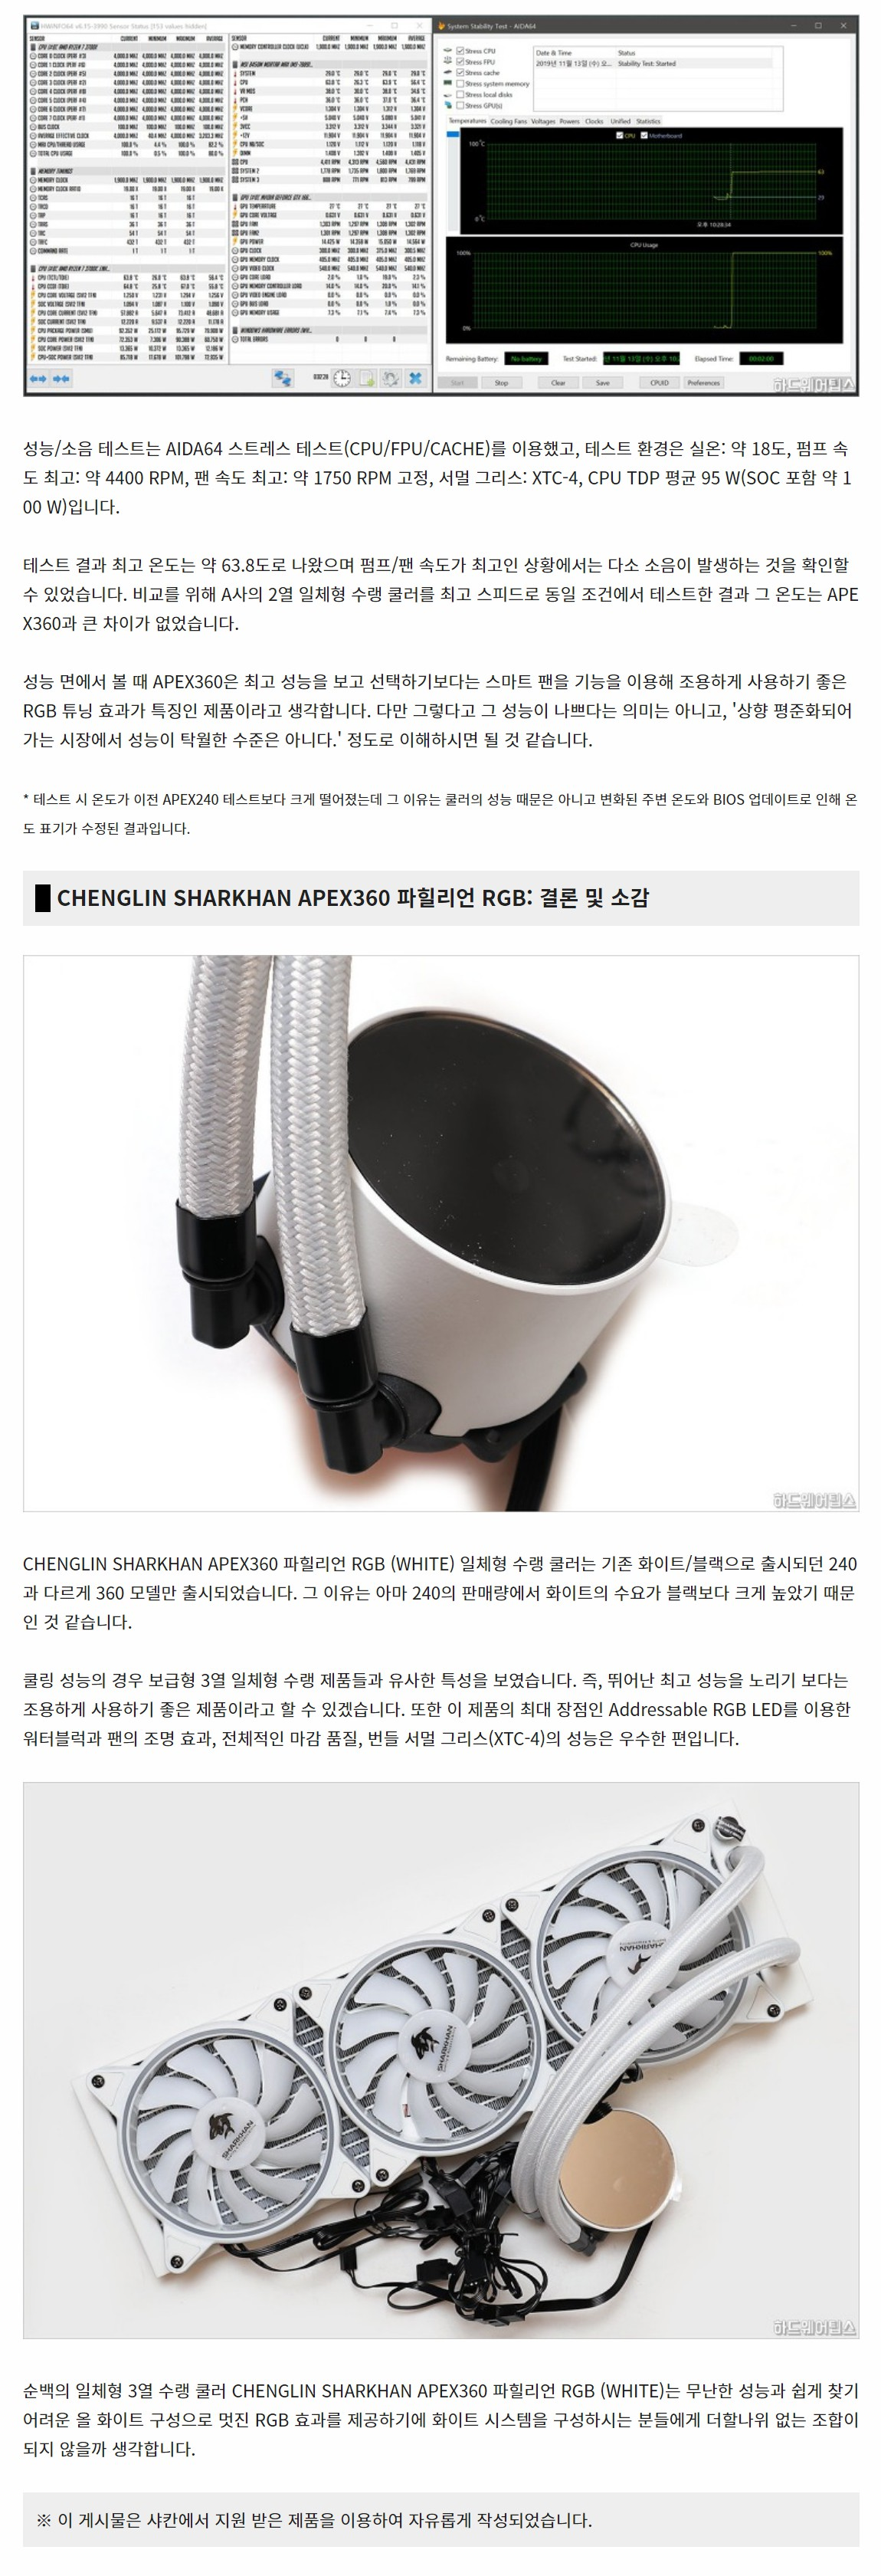 CHENGLIN SHARKHAN APEX360 파힐리언 RGB (WHITE) - 11.jpg